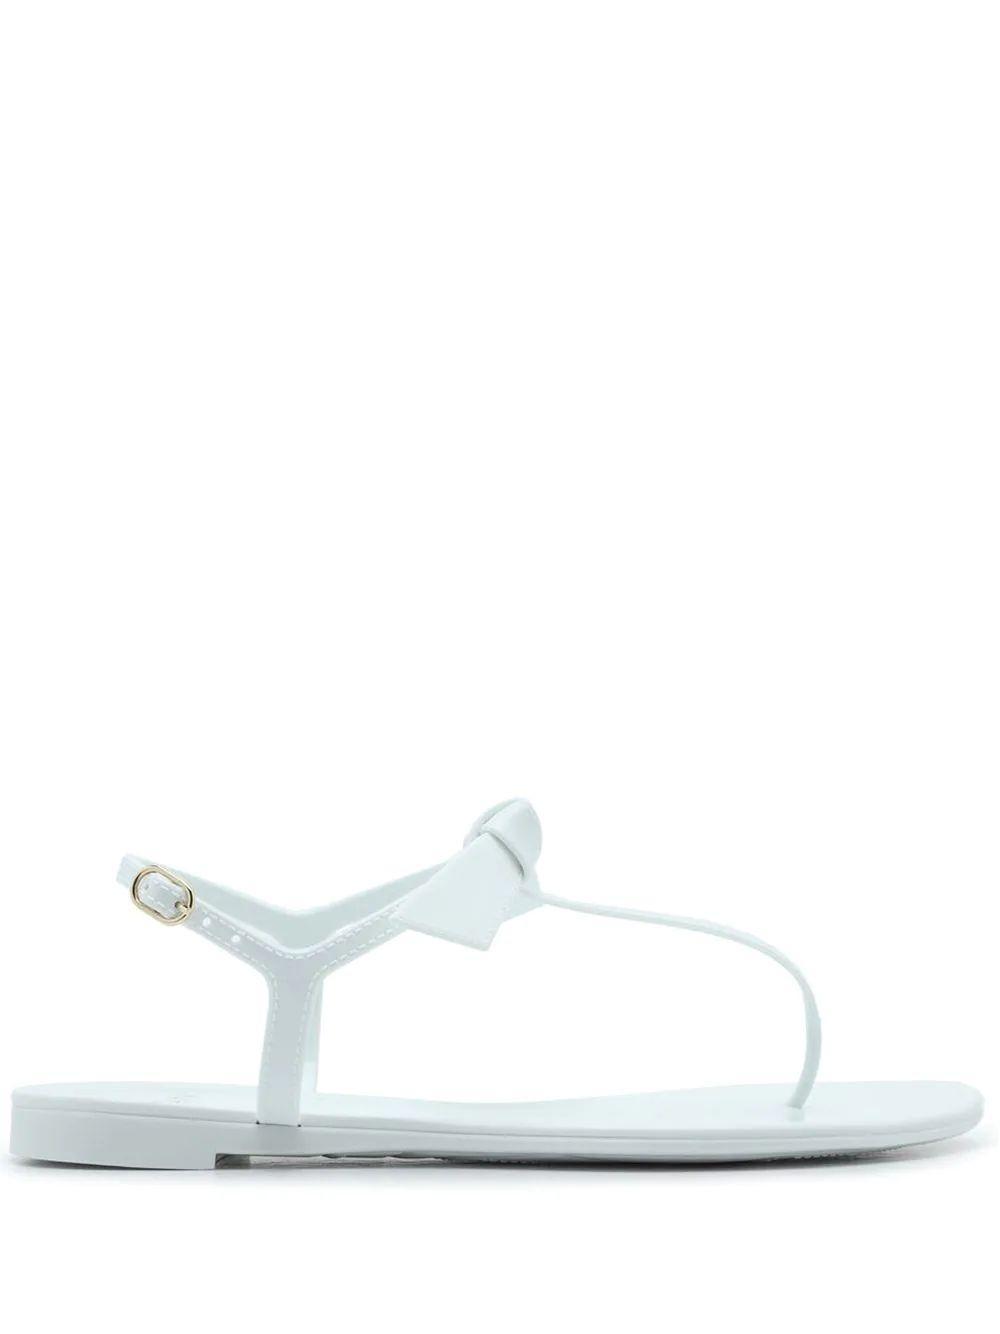 Clarita Jelly Sandal Item # B3530600010004